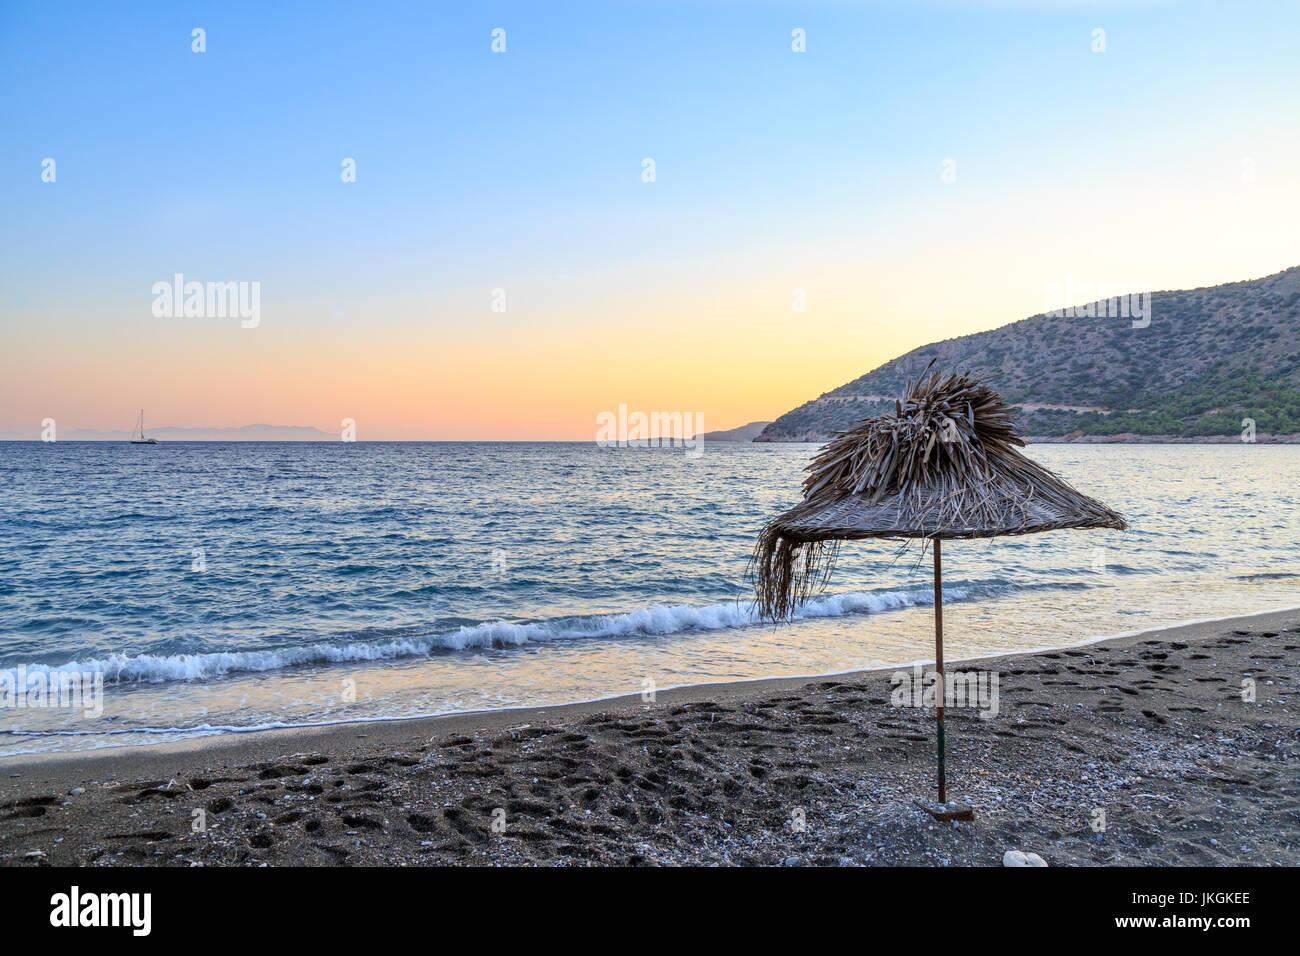 Straw umbrella on the beach during sunset - Stock Image